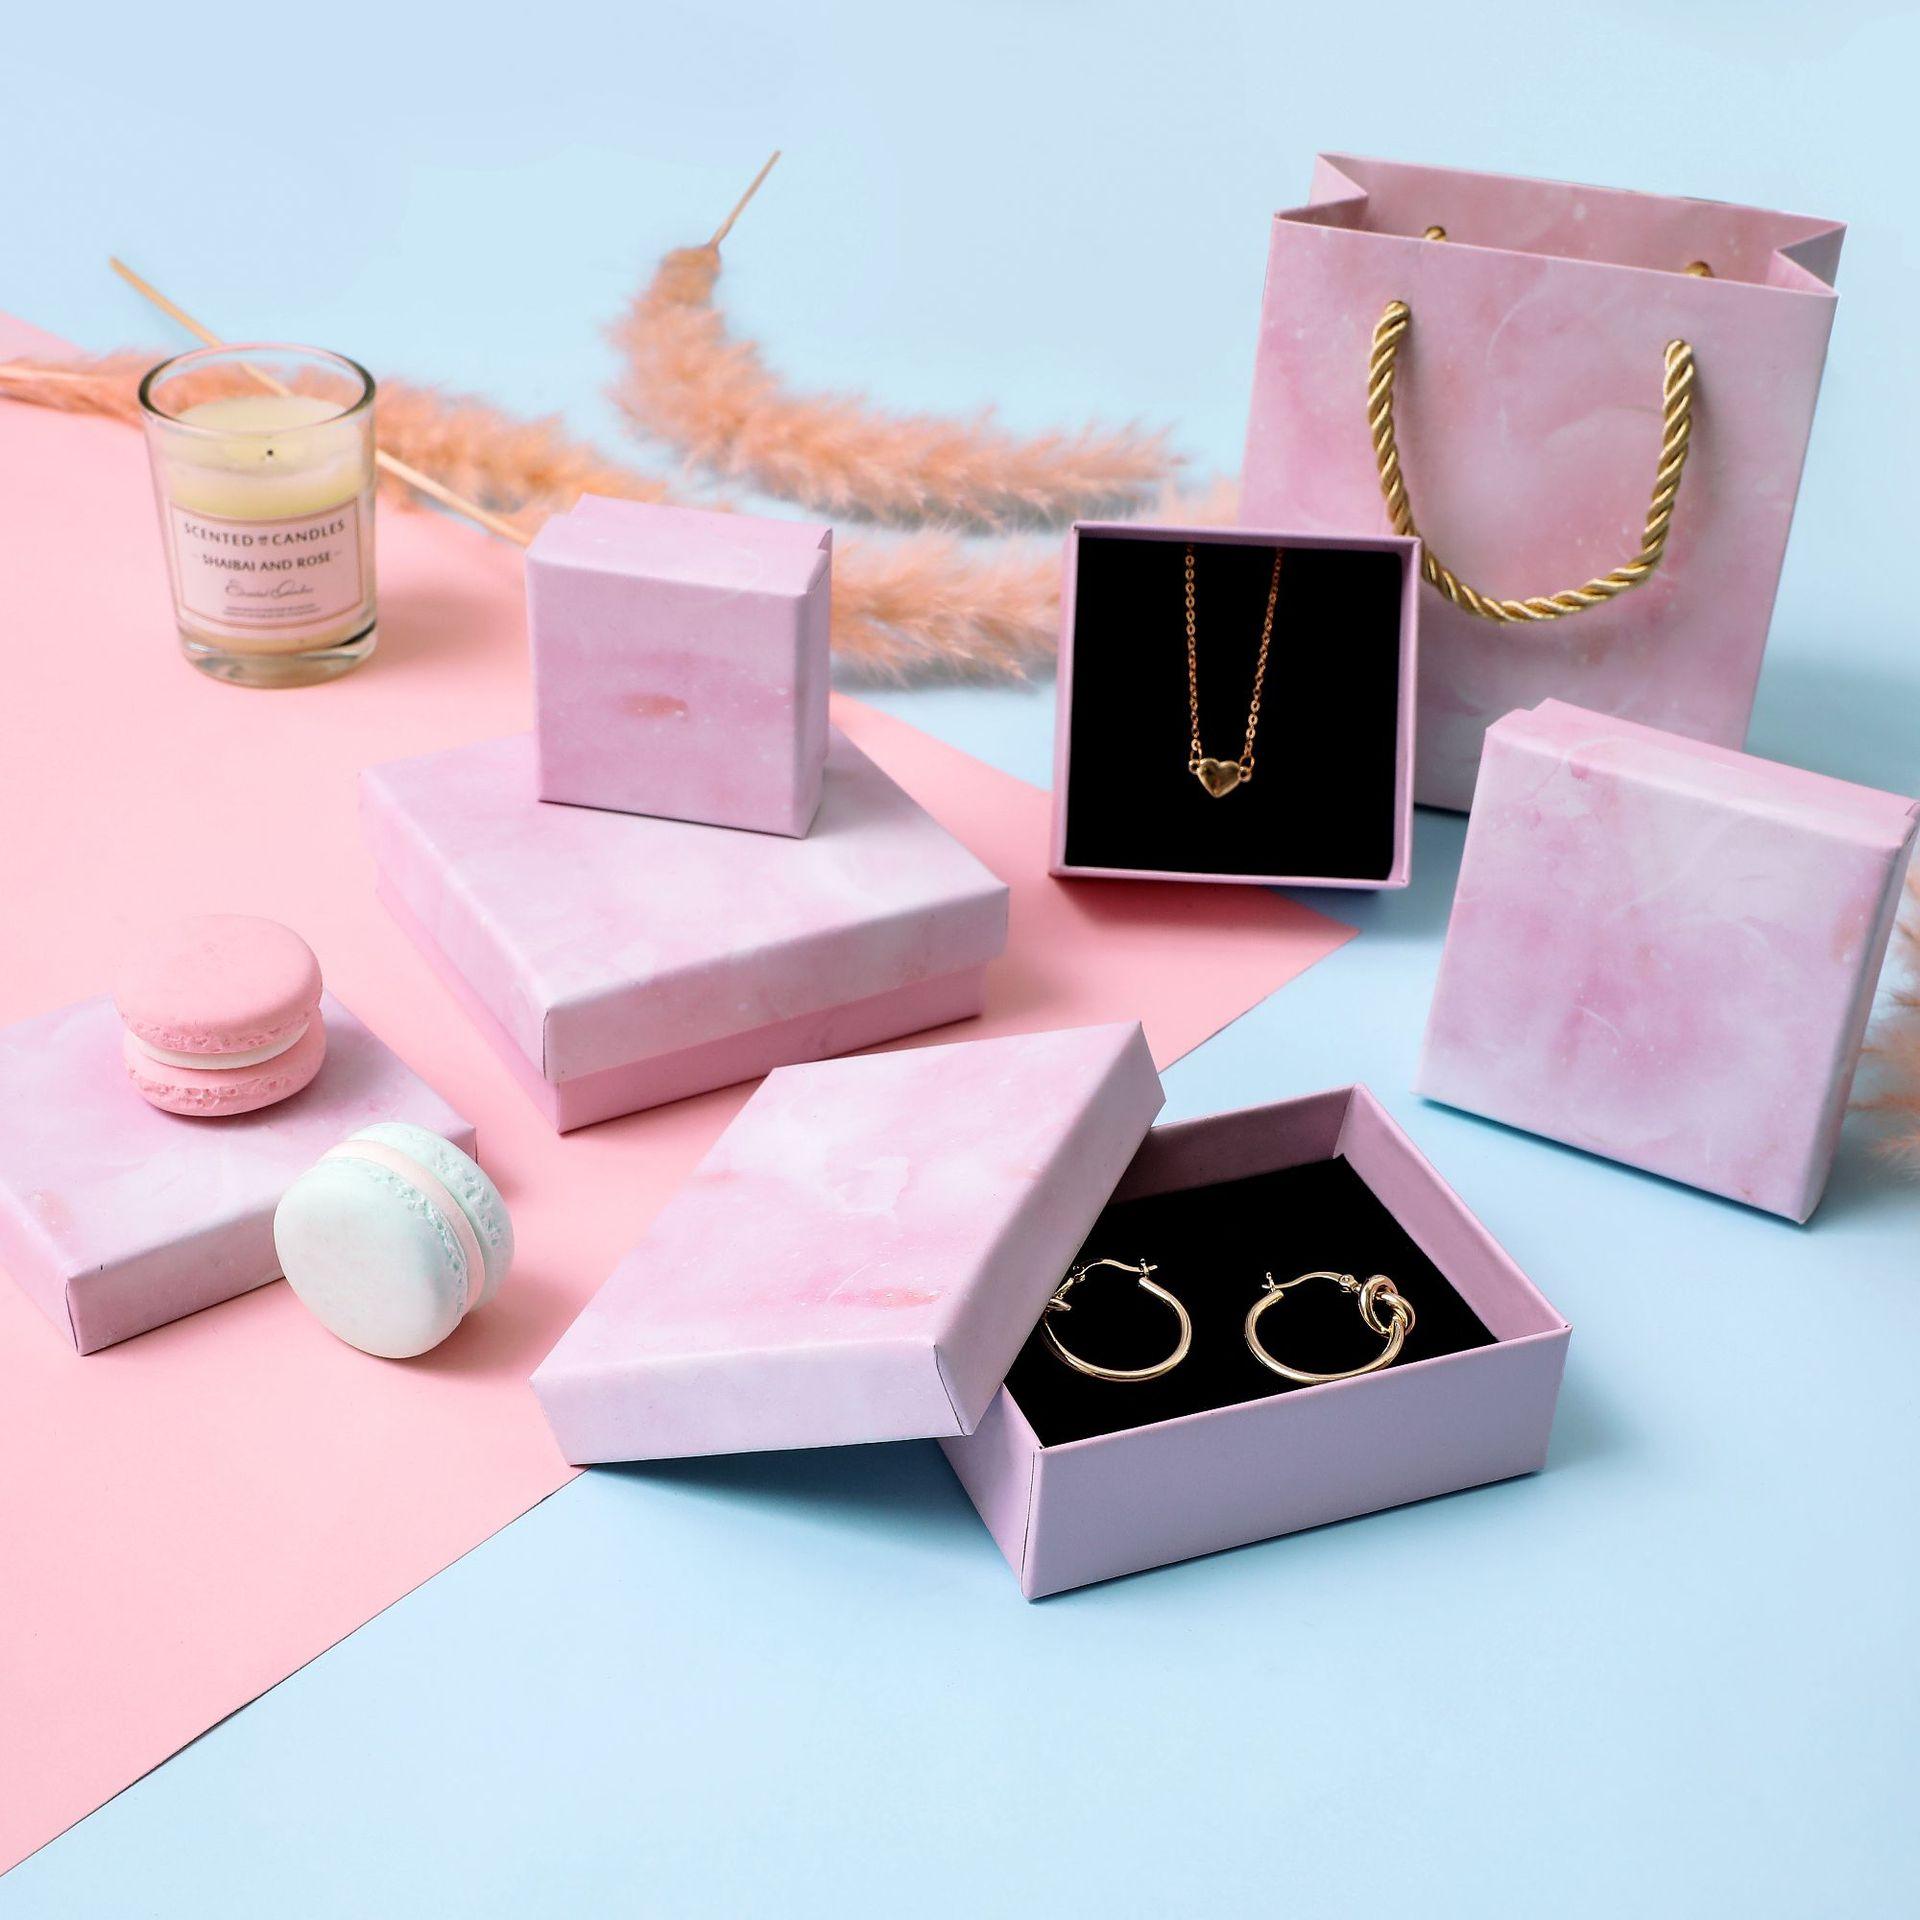 10 Pcs/Lot Wholesale Pink Box Rainbow Printing Kraft Paper Favour Gift Jewelry Box/Bag Vintage Design Bulk Rings/Earrings Box